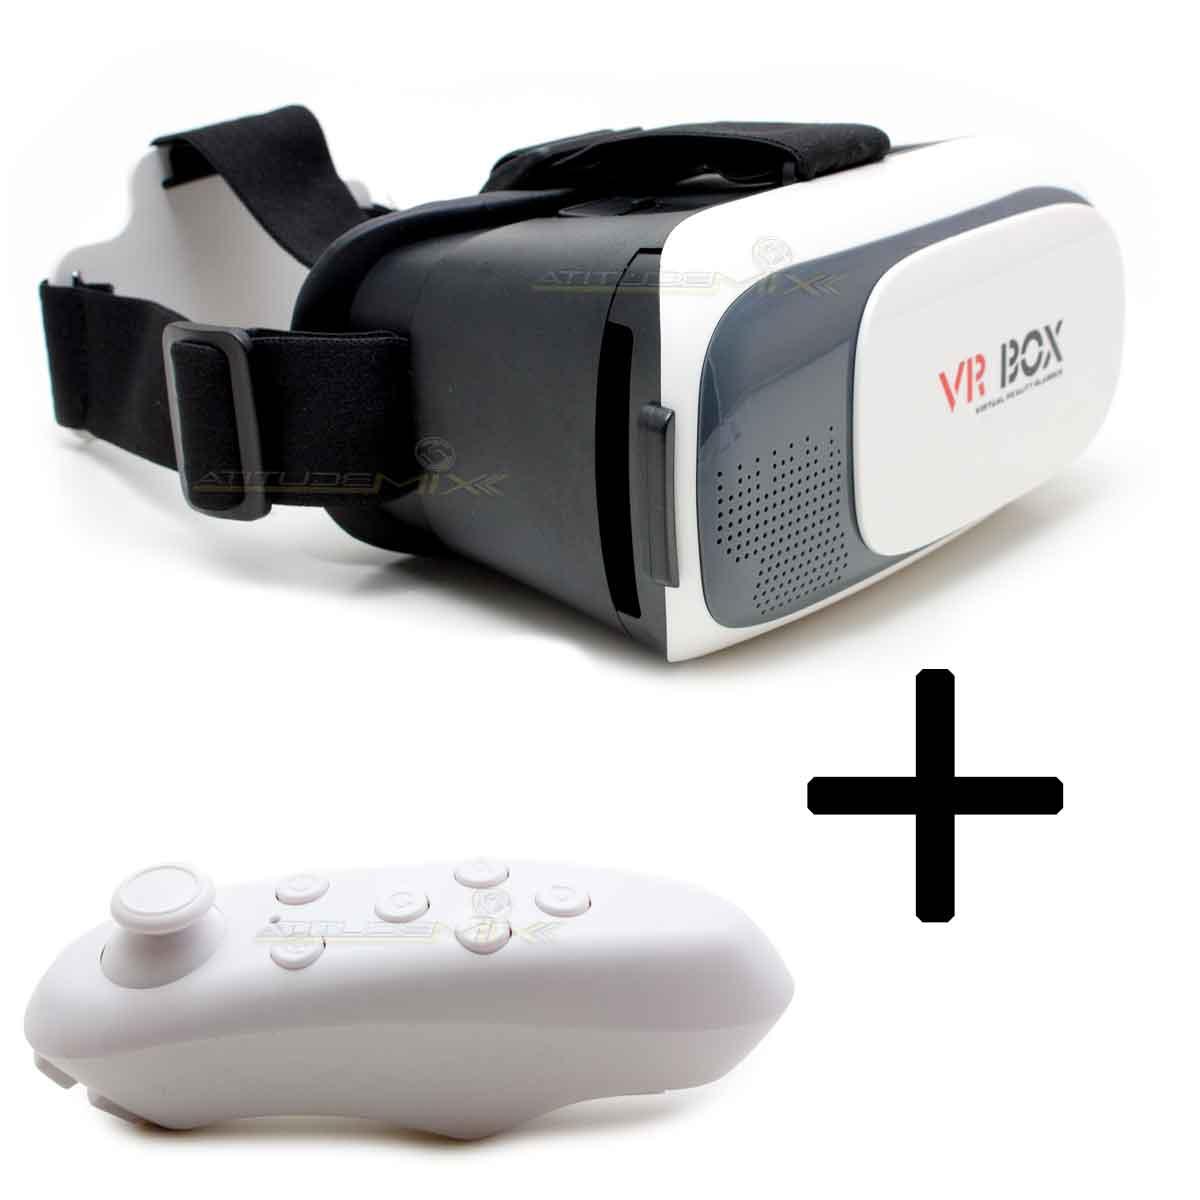 Óculos Cardboard 3d Realidade Virtual Android Ios Vr Box